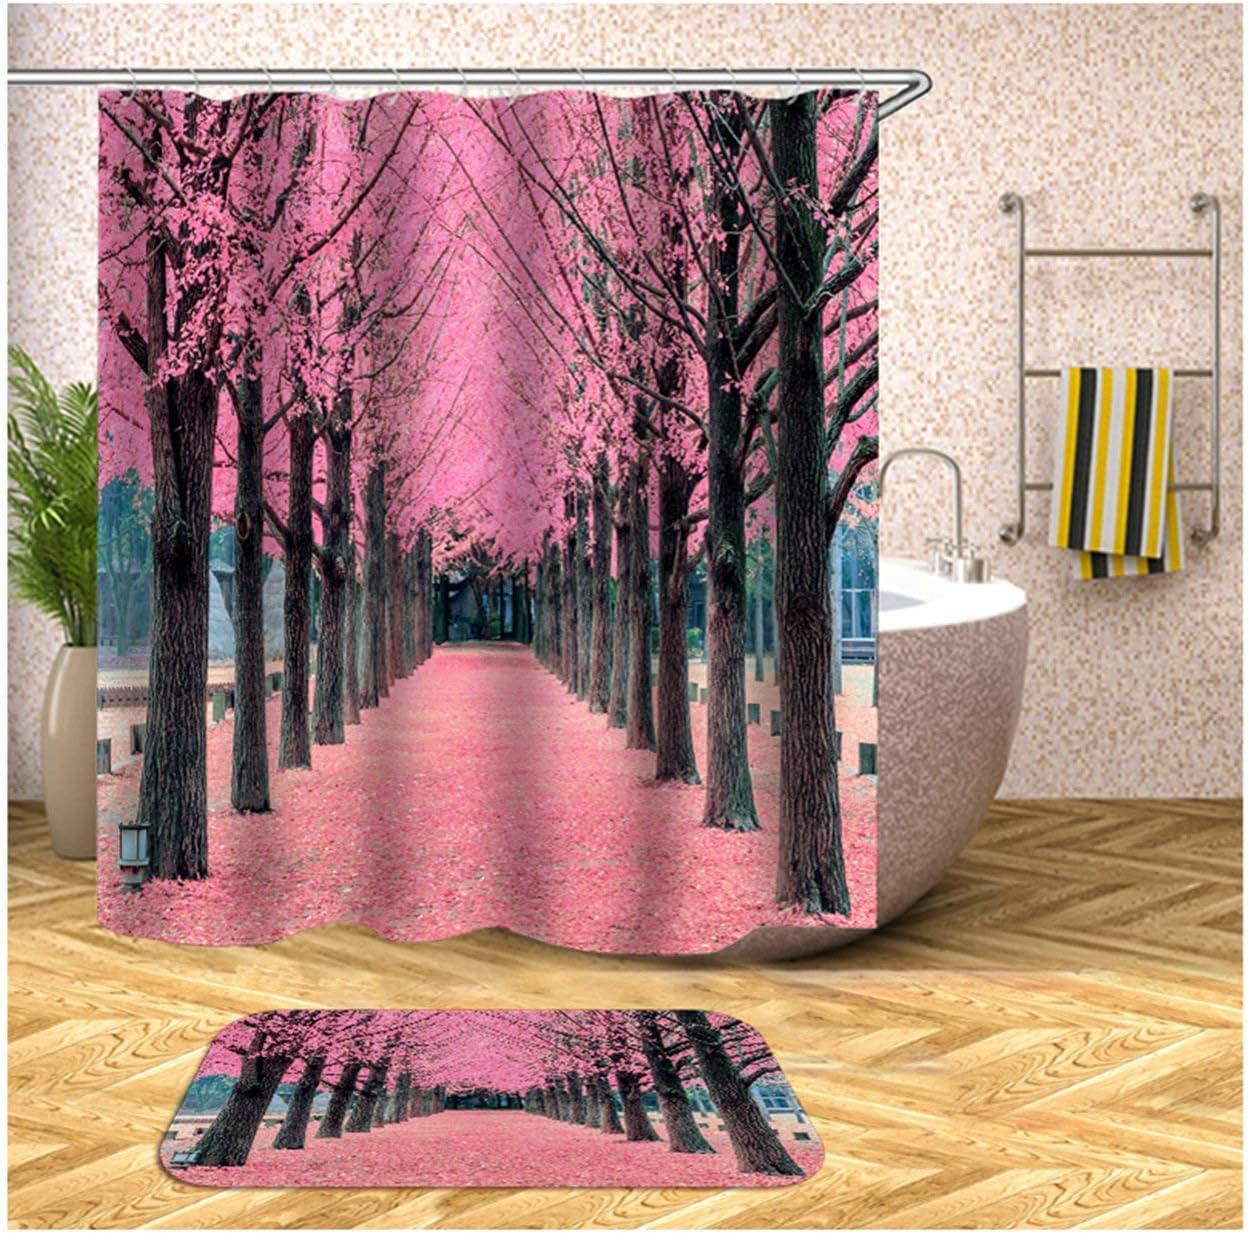 Epinki 2PCS Conjunto Cortina de baño Colorido Arboles Flores Cortina Ducha con 12 Anillos Cortina para baño 165x180CM